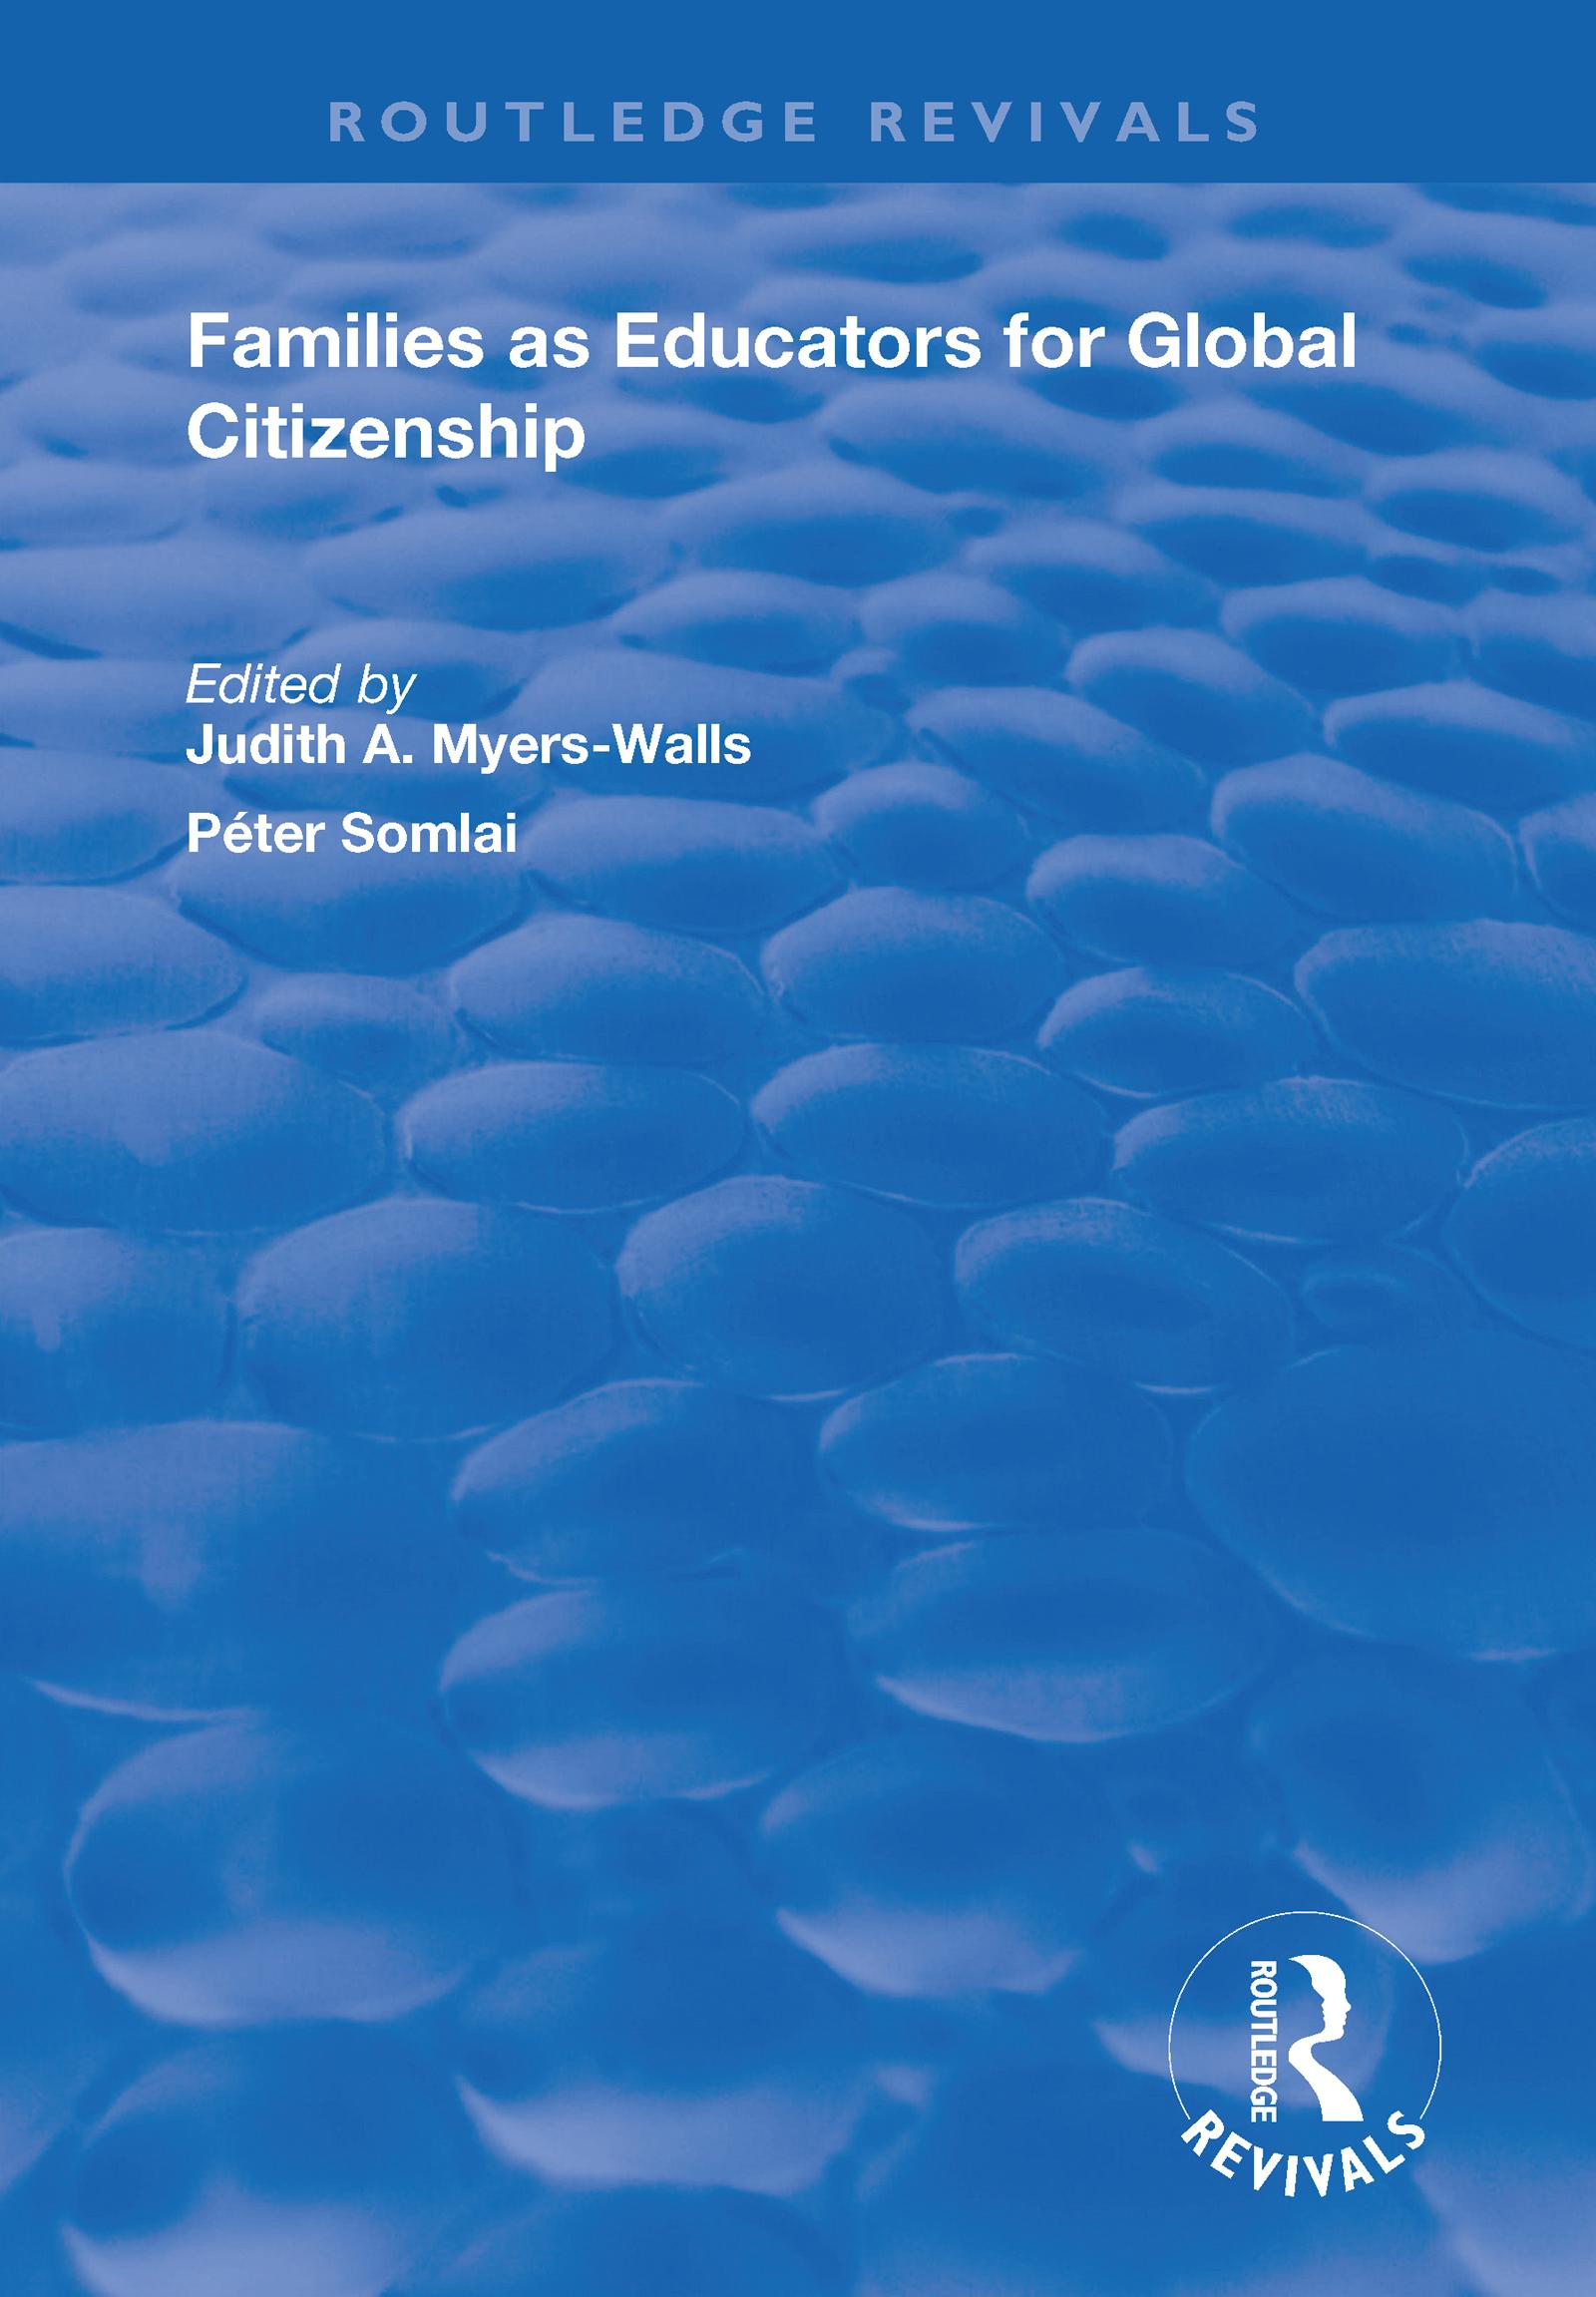 Families as Educators for Global Citizenship